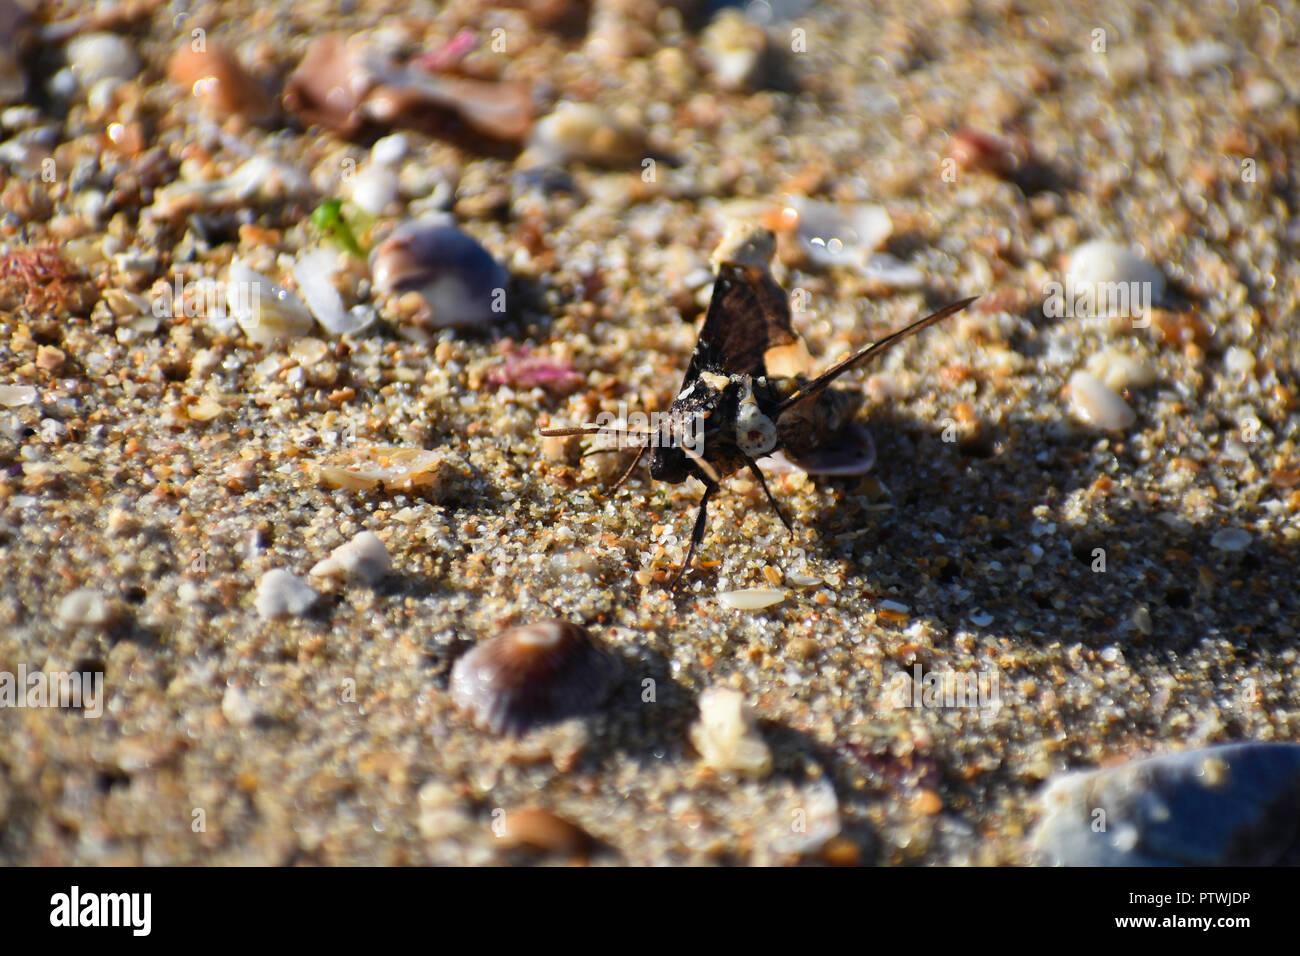 Hummingbird Moth (macroglossum sp.) Emerged From Wet Beach Sand, Western Cape, South Africa - Stock Image